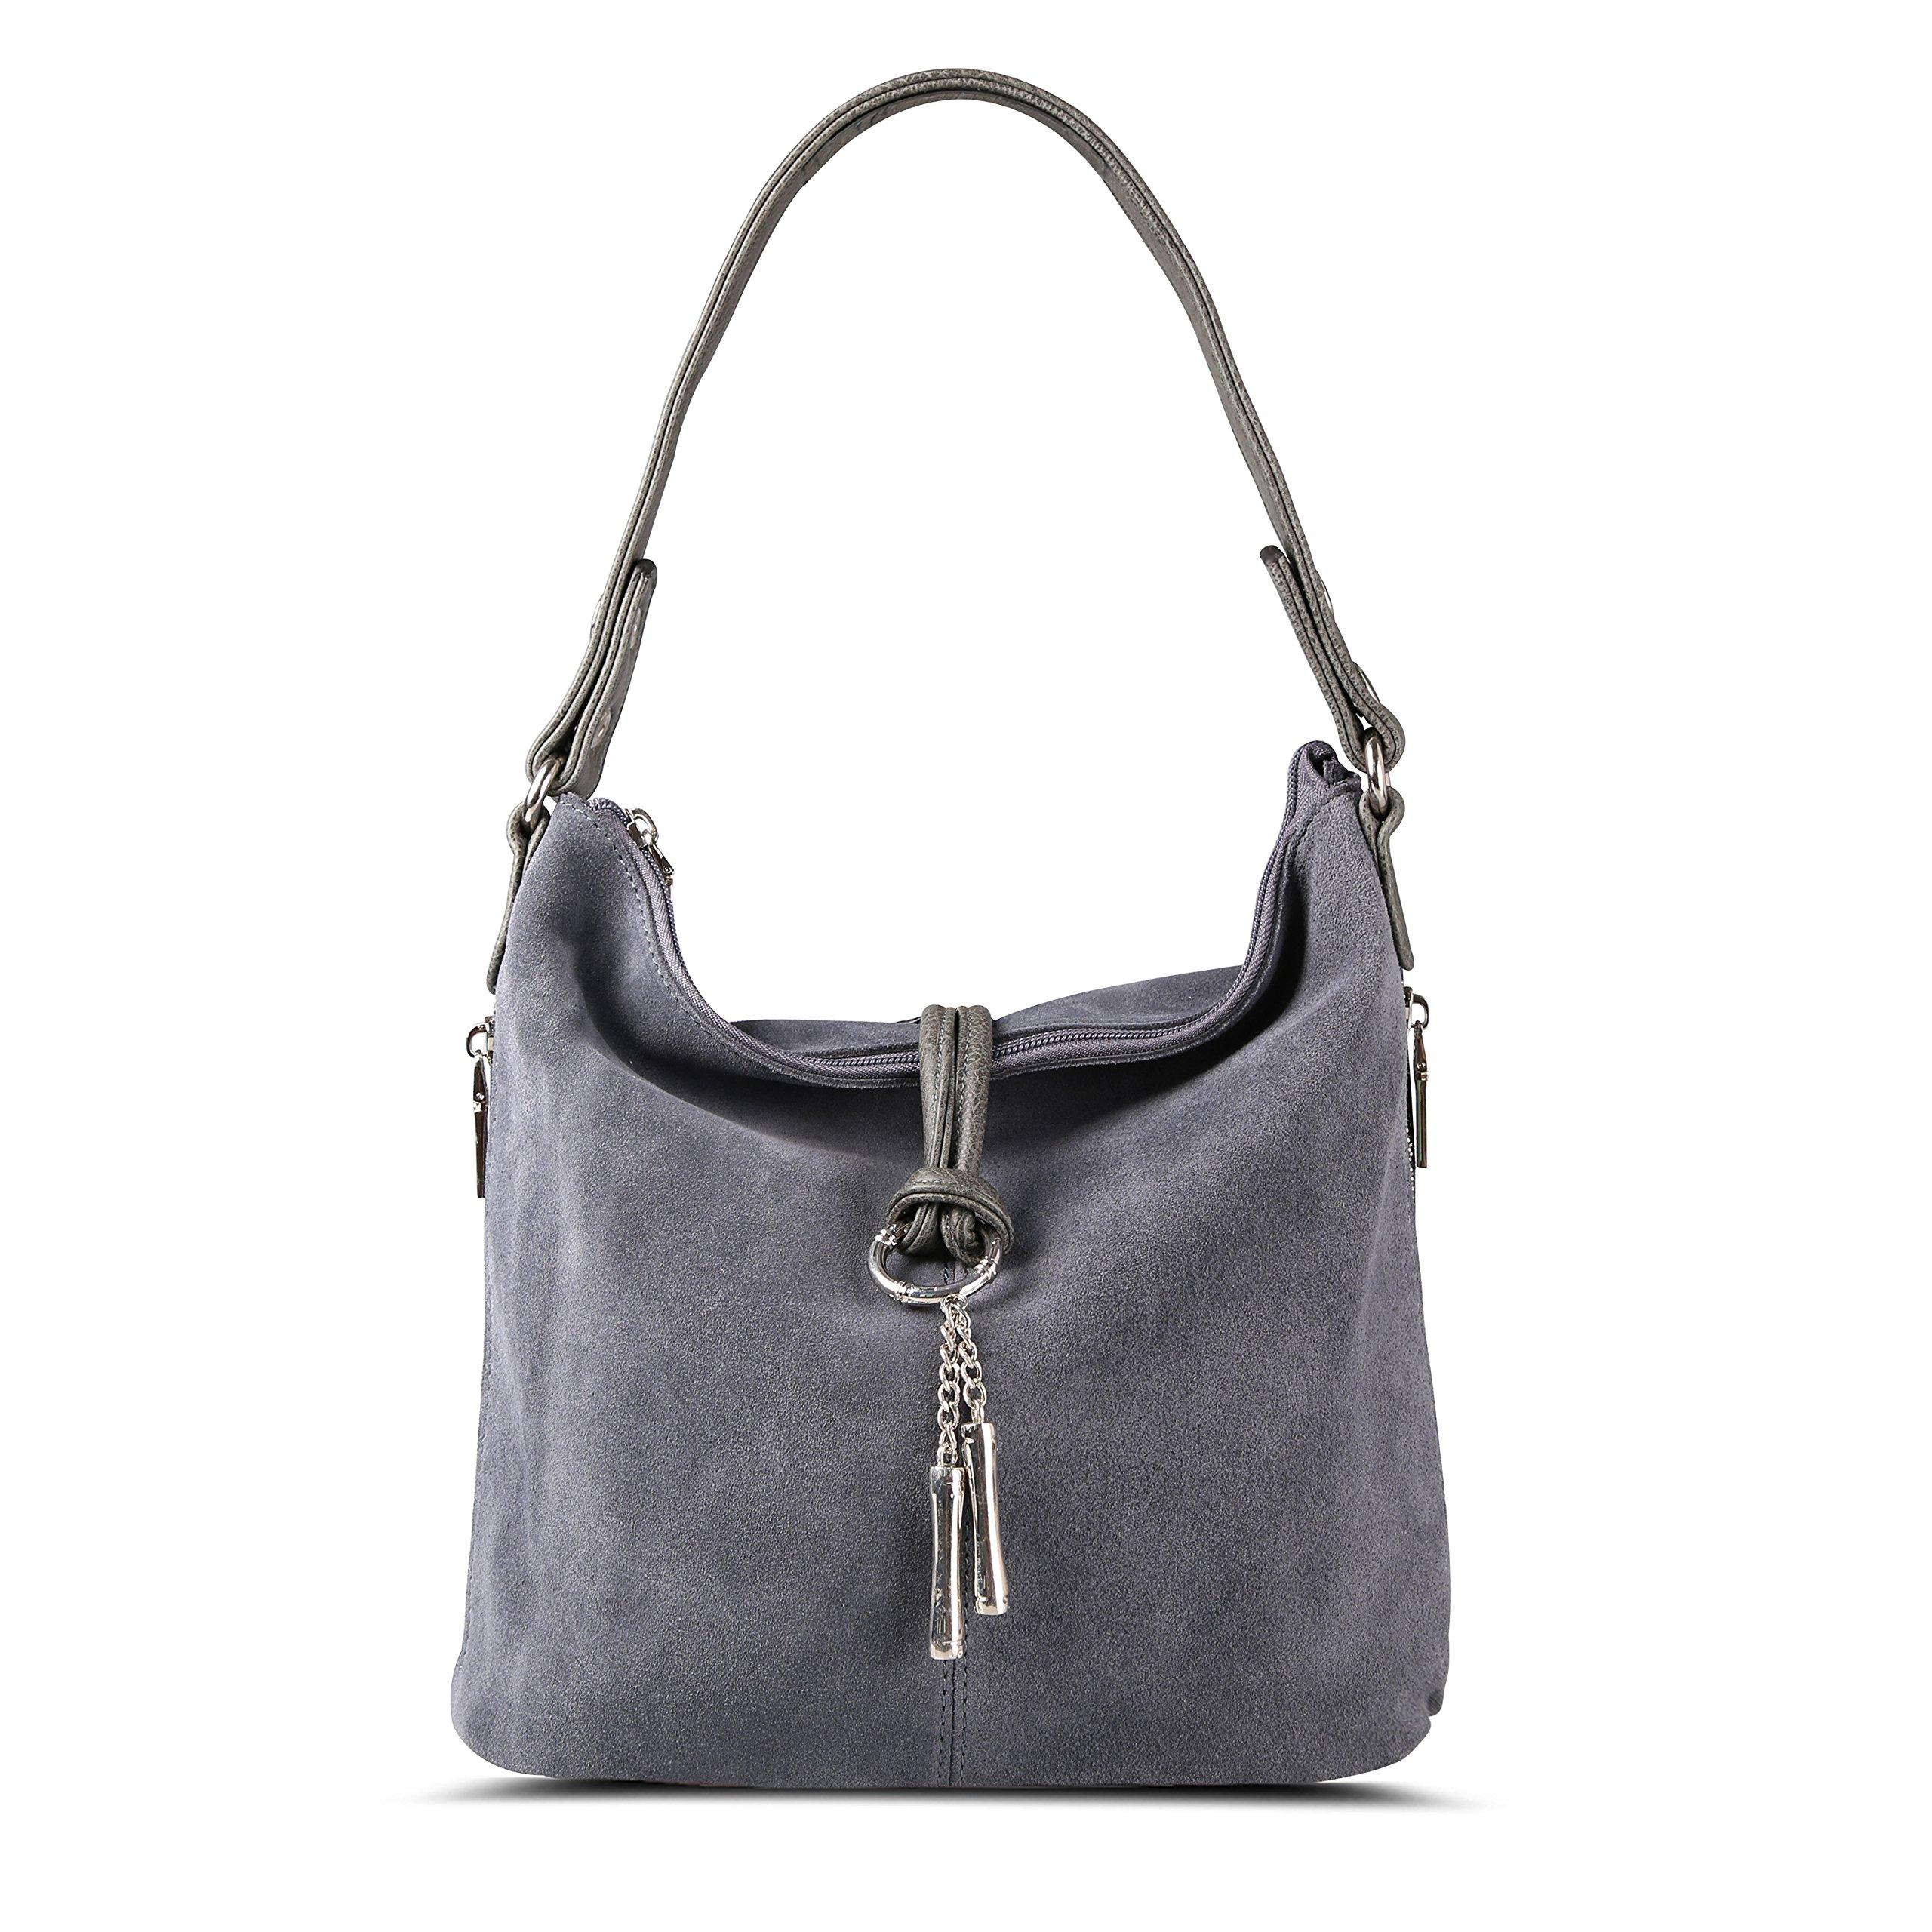 Nico Louise Women Purse Suede Split Real Leather Shoulder Bag Casual Crossbody Hobo handbag (LightGrey)